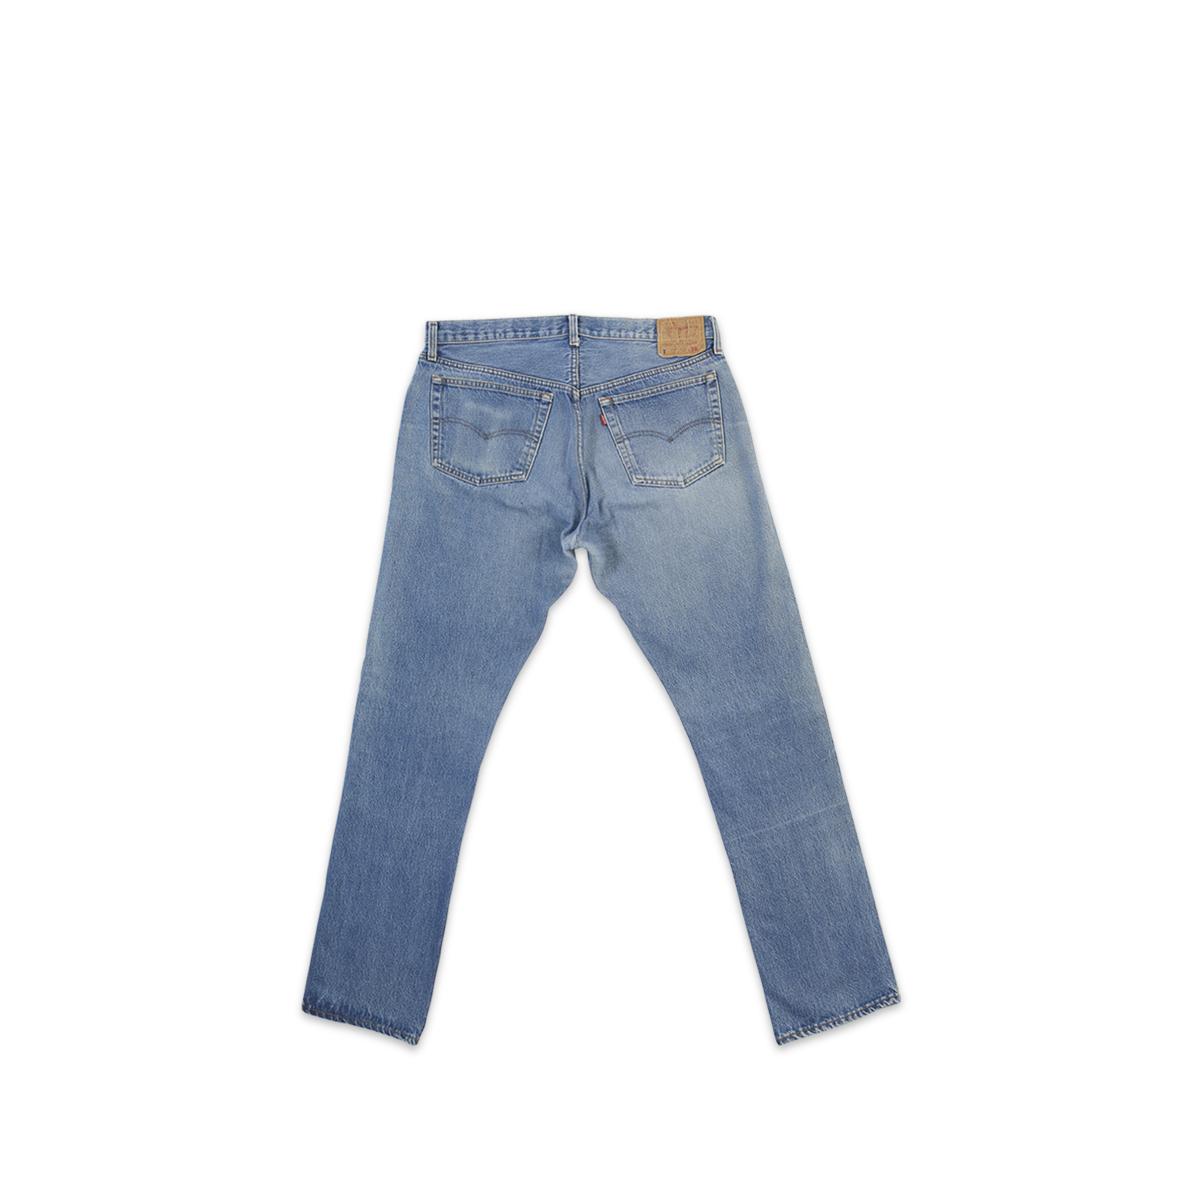 LEVIS AV 501 Vintage - Size 38